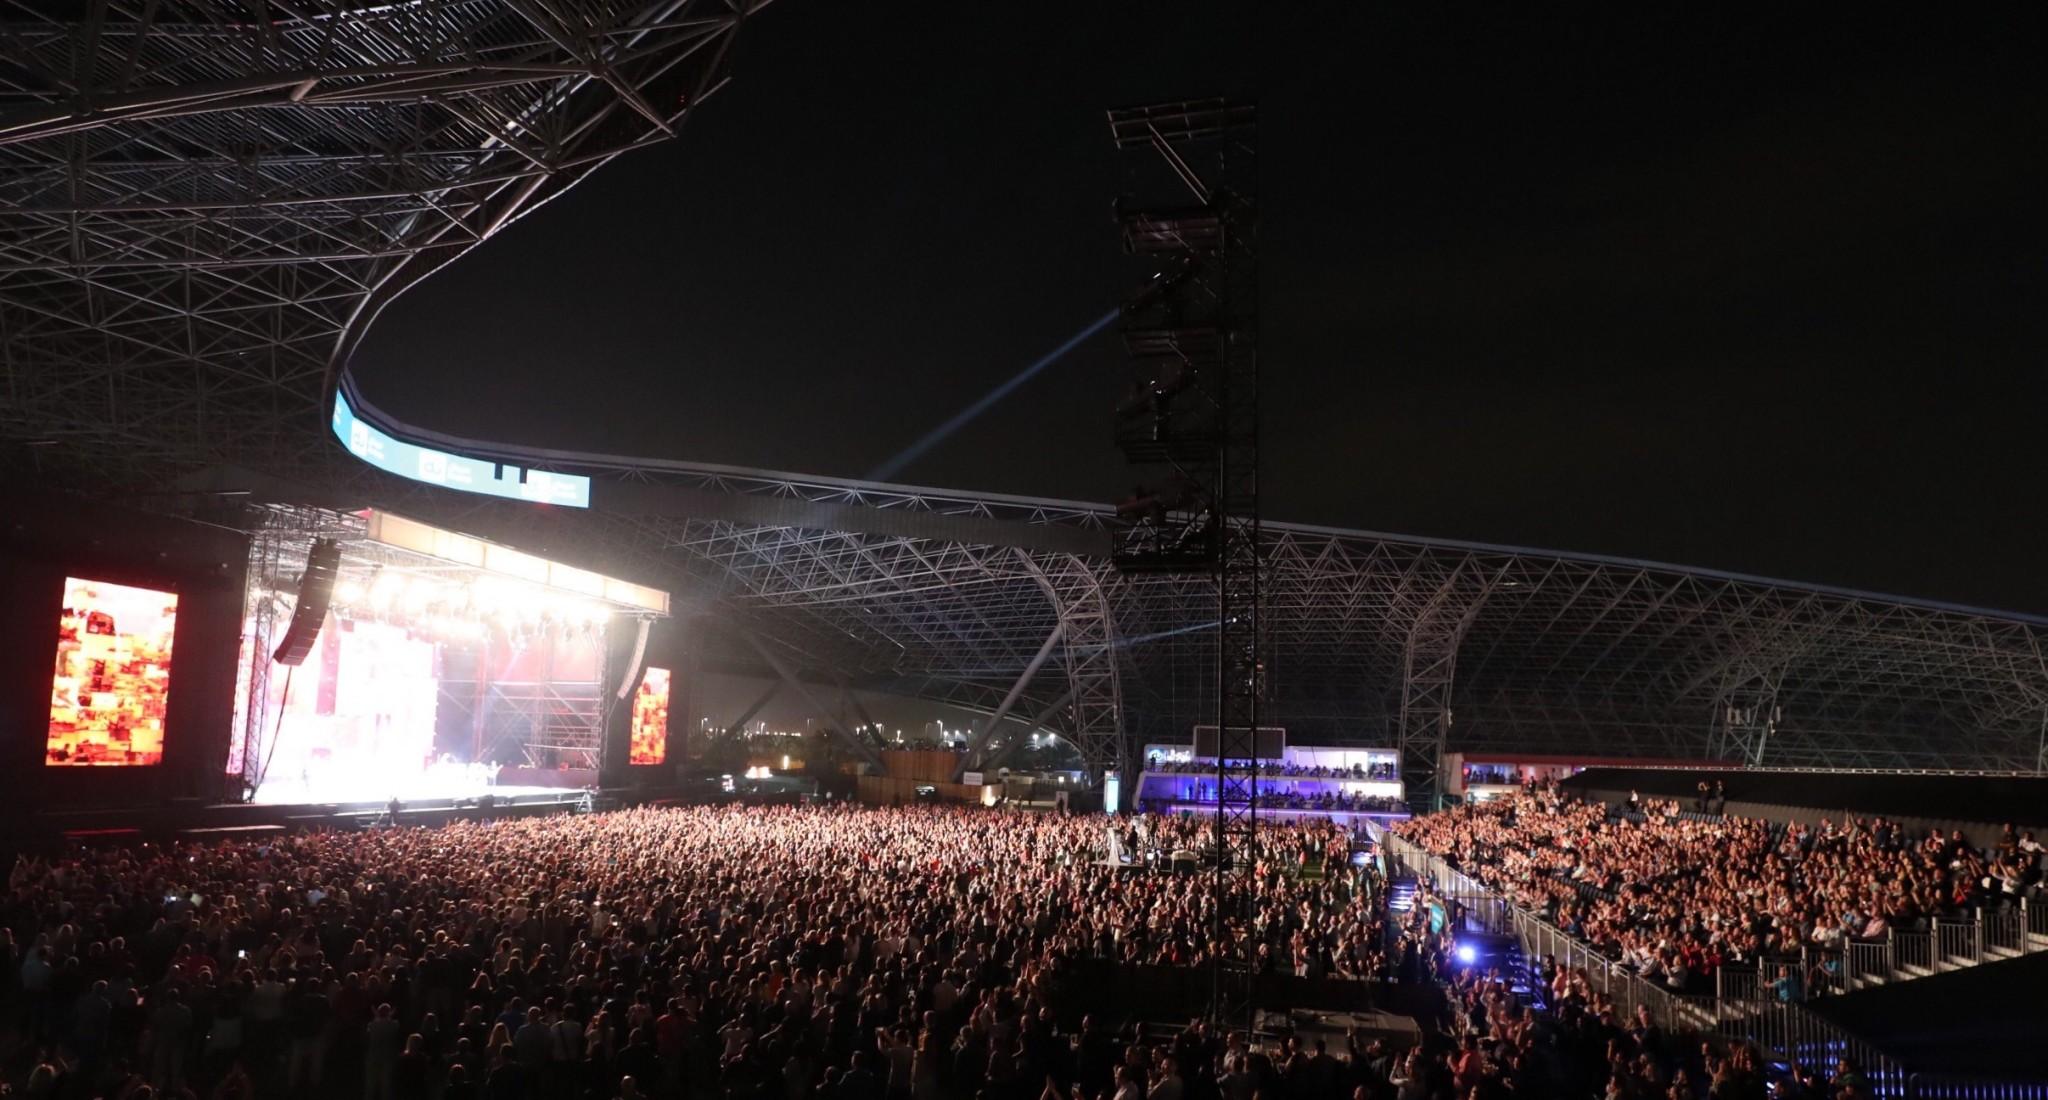 du arena concerts abu dhabi grand prix